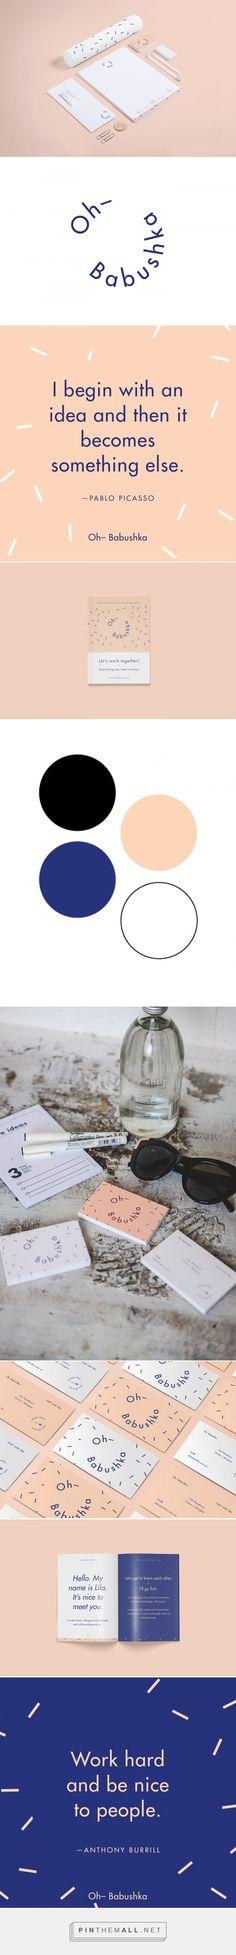 Oh Babushka Designer Branding by Lila Theodoros | Fivestar Branding Agency – Design and Branding Agency & Curated Inspiration Gallery